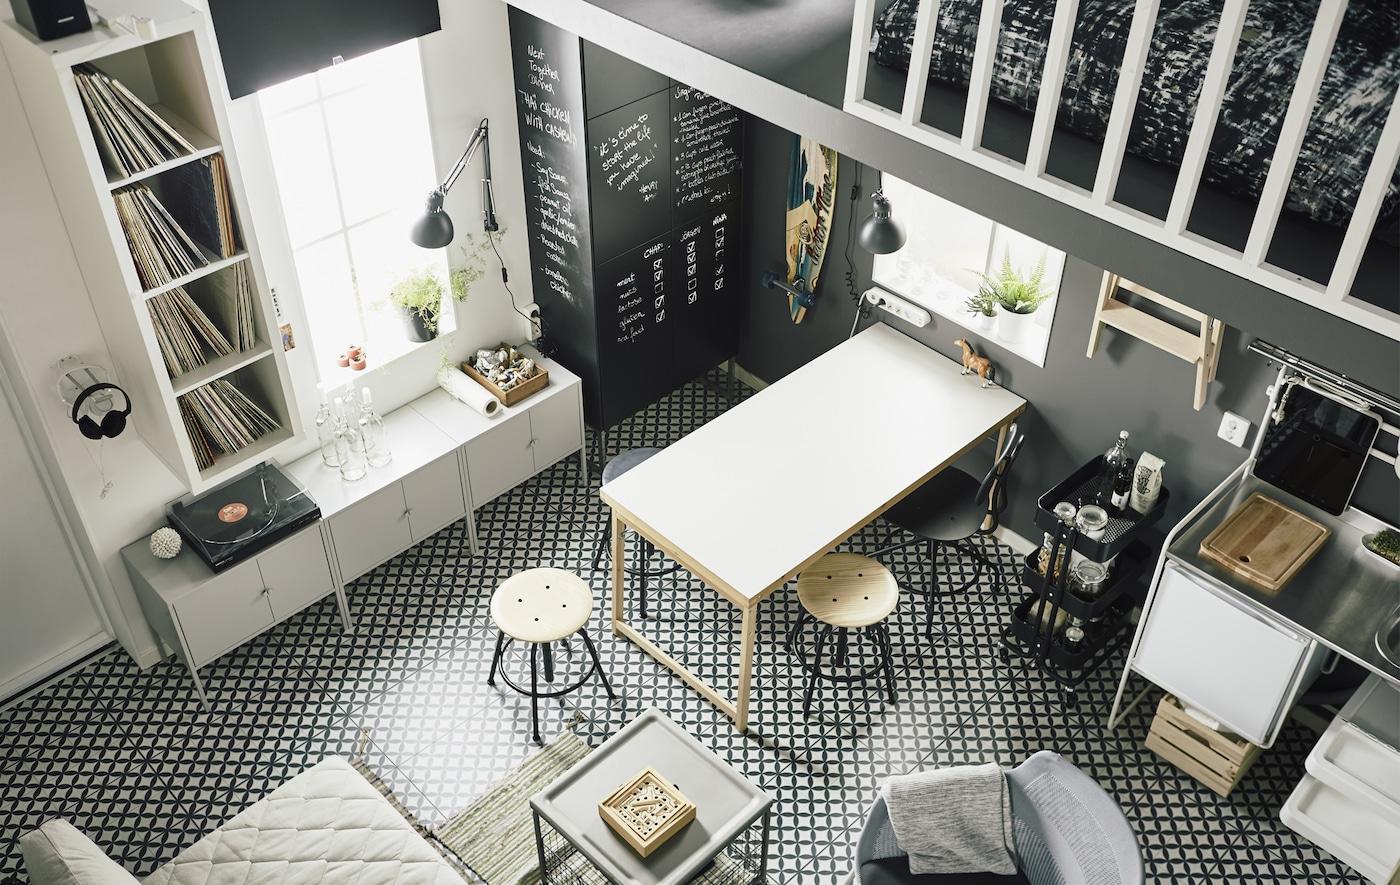 Table De Cuisine Gain De Place un petit studio ingénieux - ikea